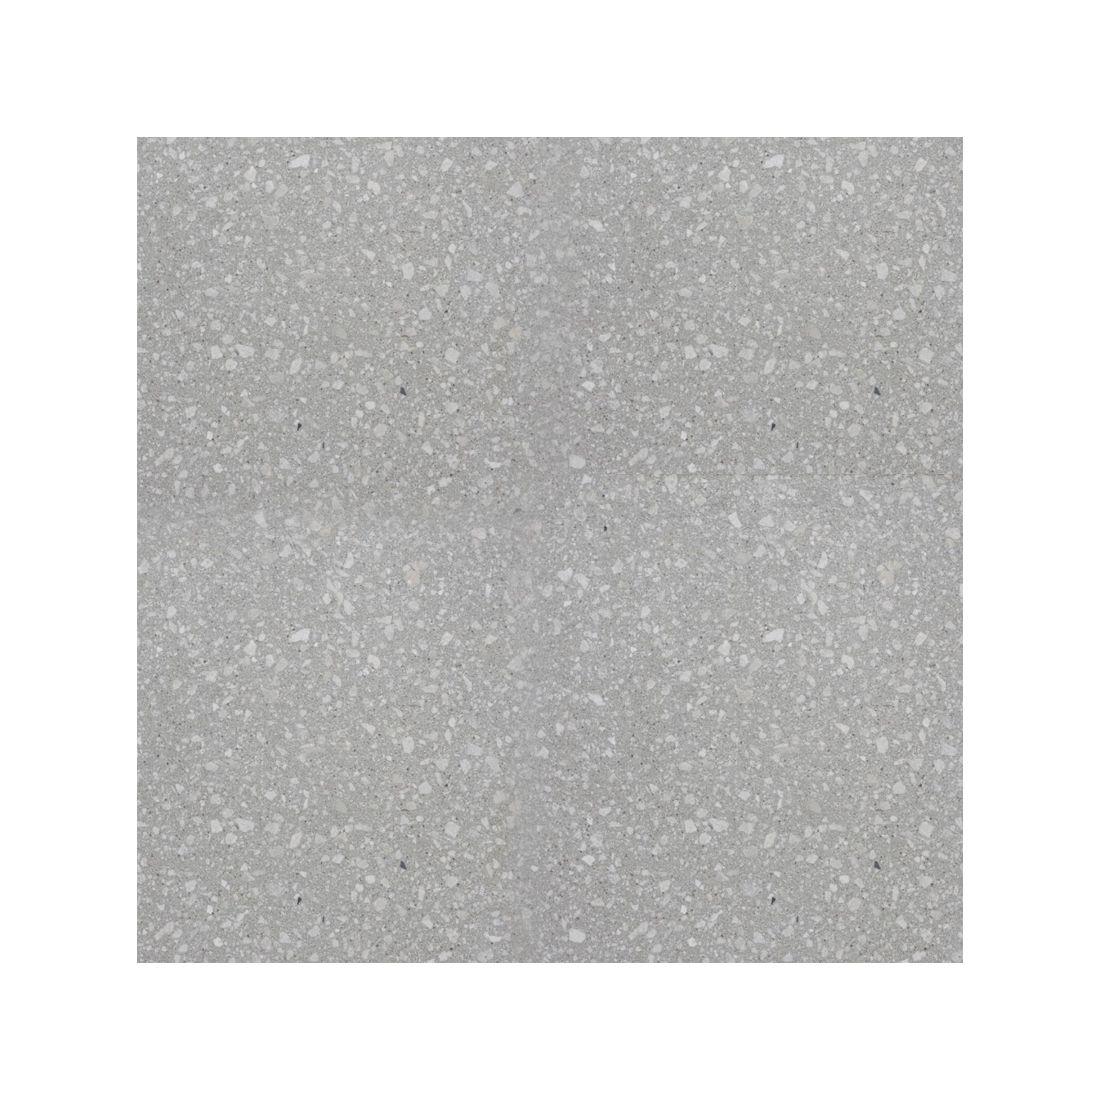 Terrazzo Honed Paver Silver Pearl 600 x 600 x 40mm